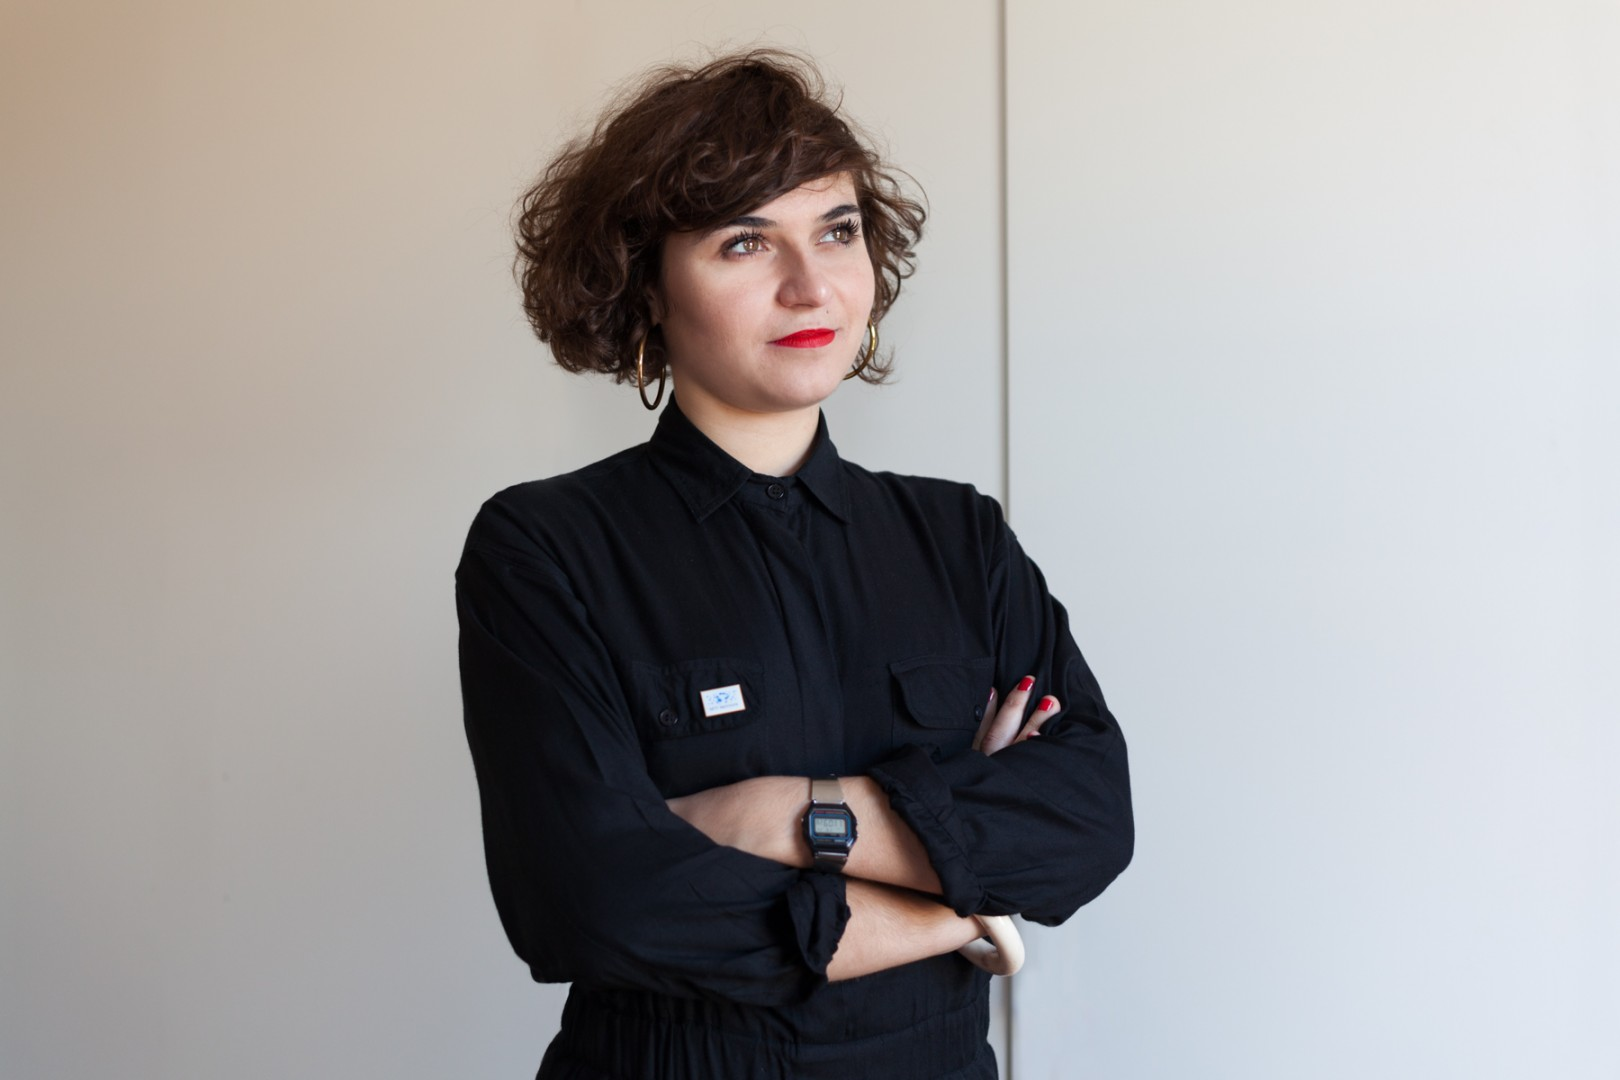 Nelly Ben Hayoun, Photo by Amandine Alessandra